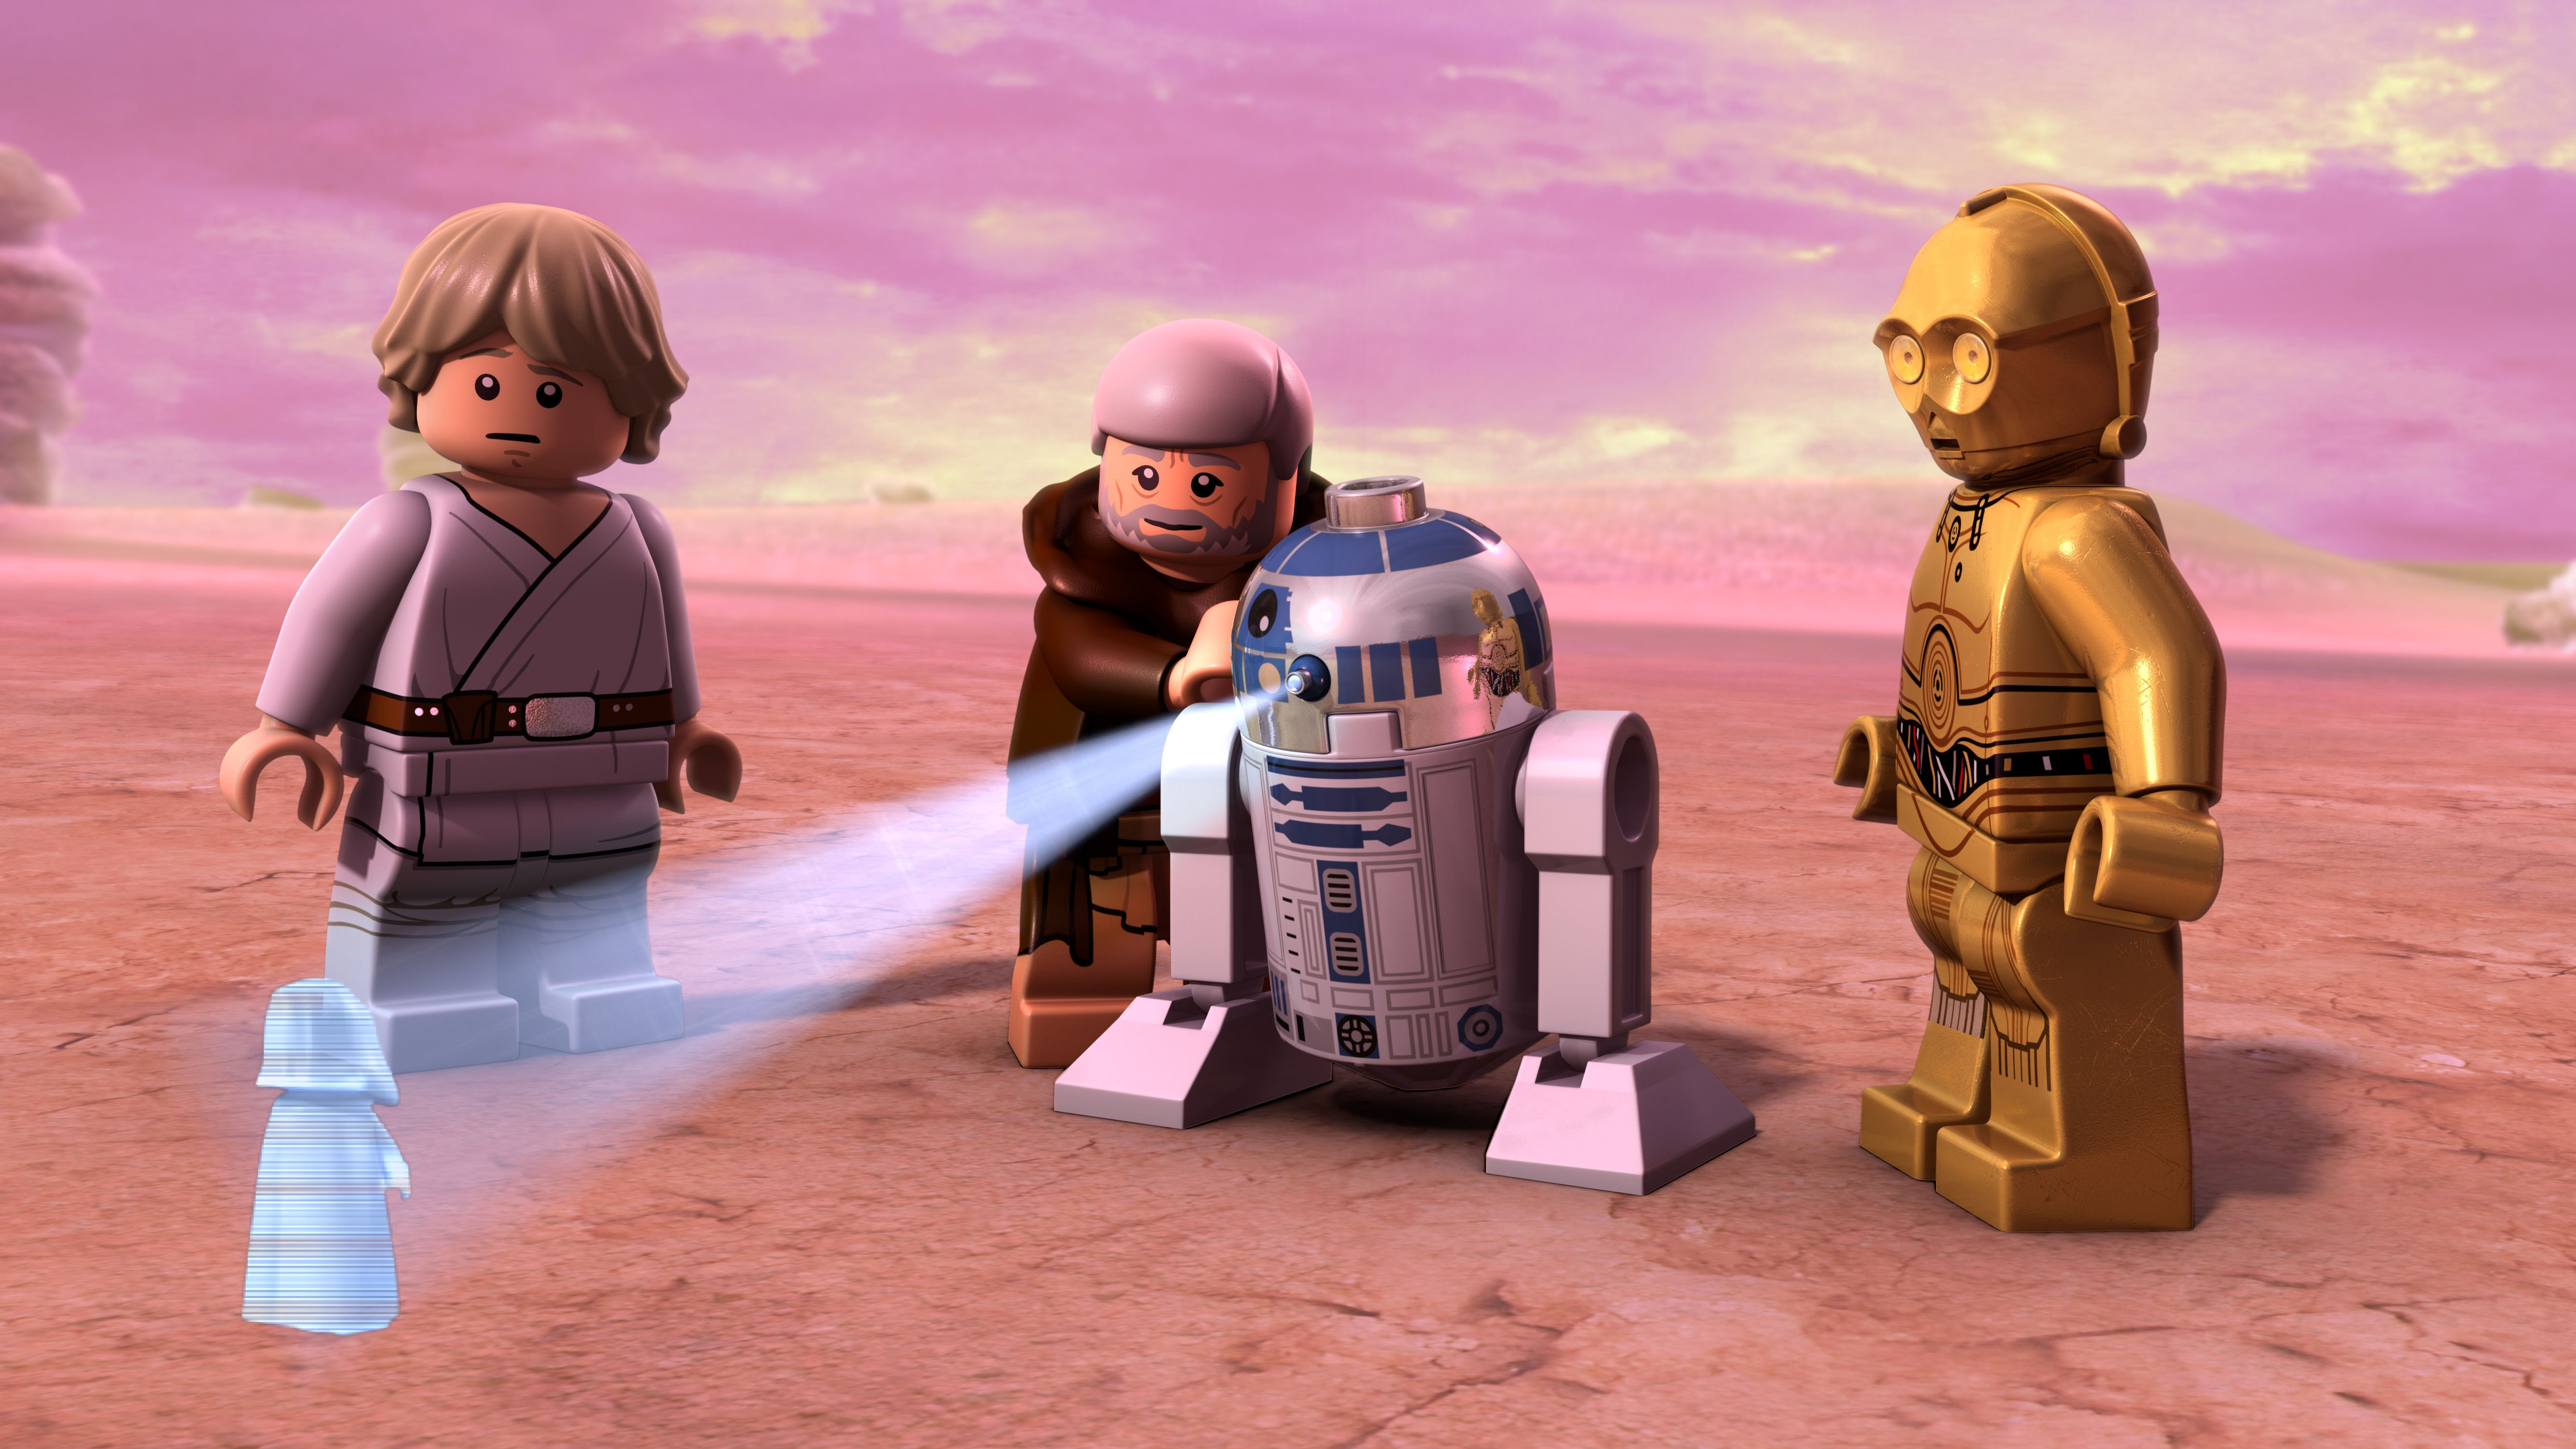 Lego Star Wars Droid Tales, HD Movies, 4k Wallpapers ...